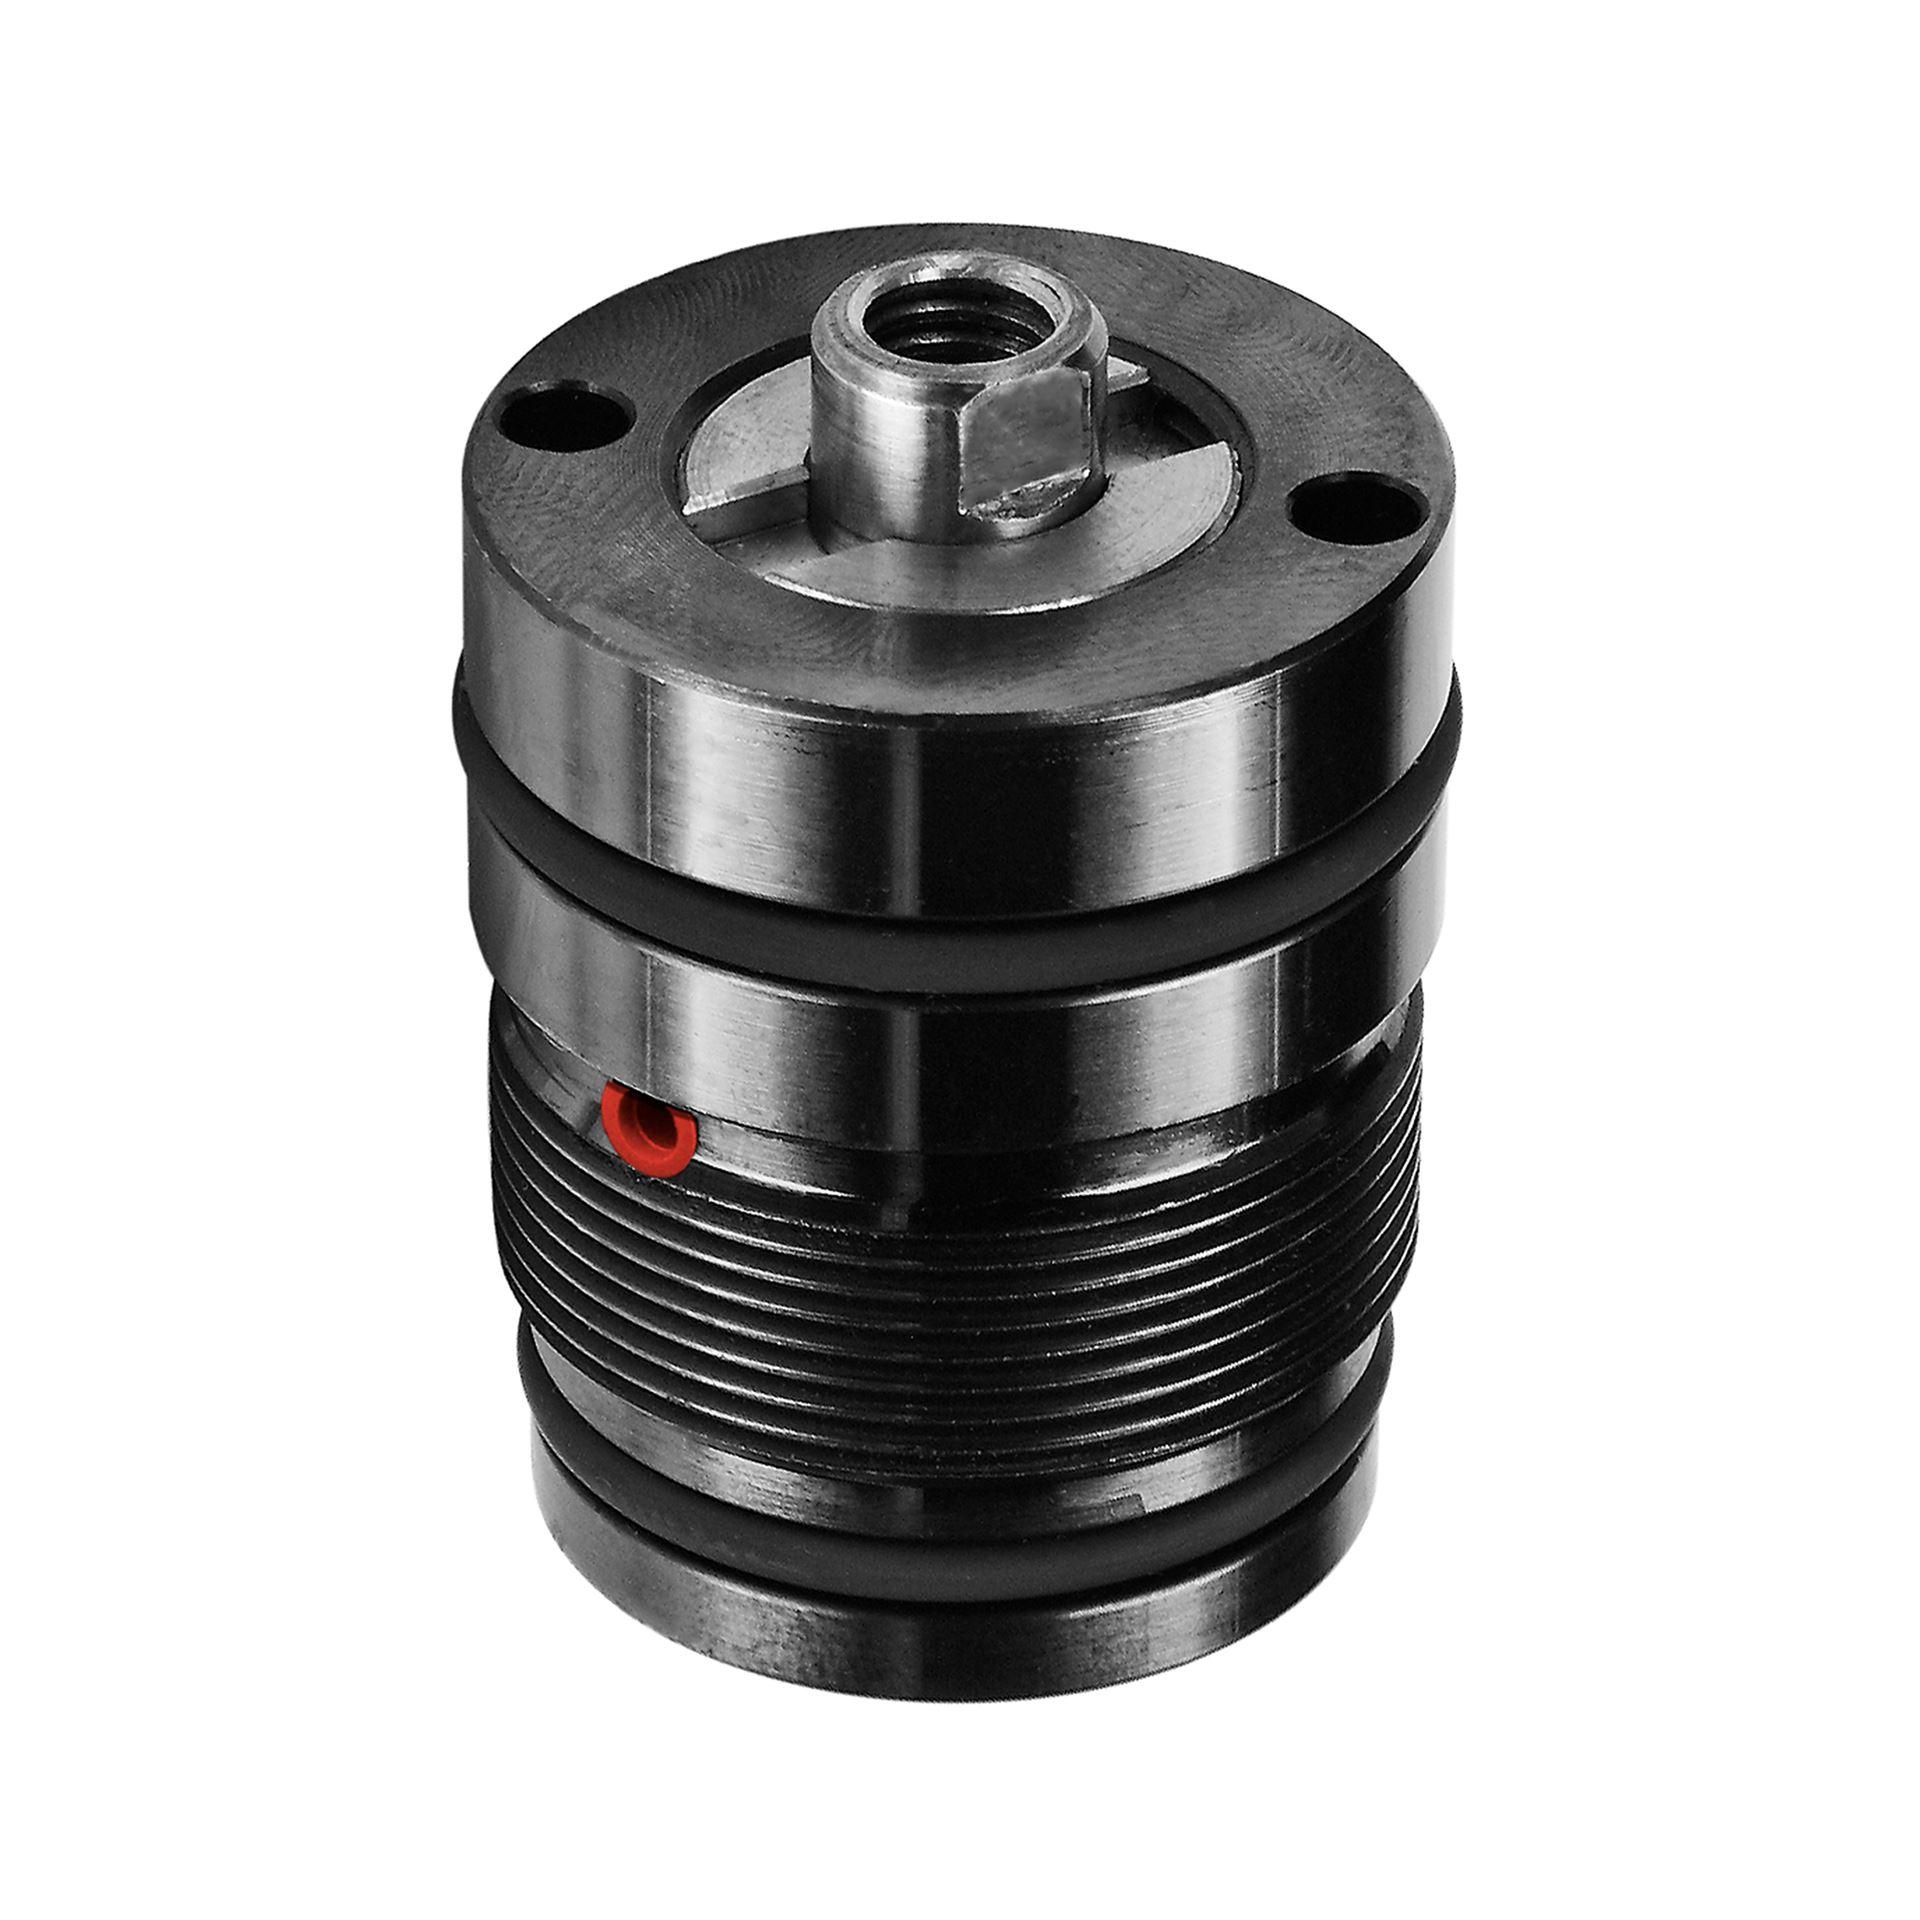 Screw-in cylinder